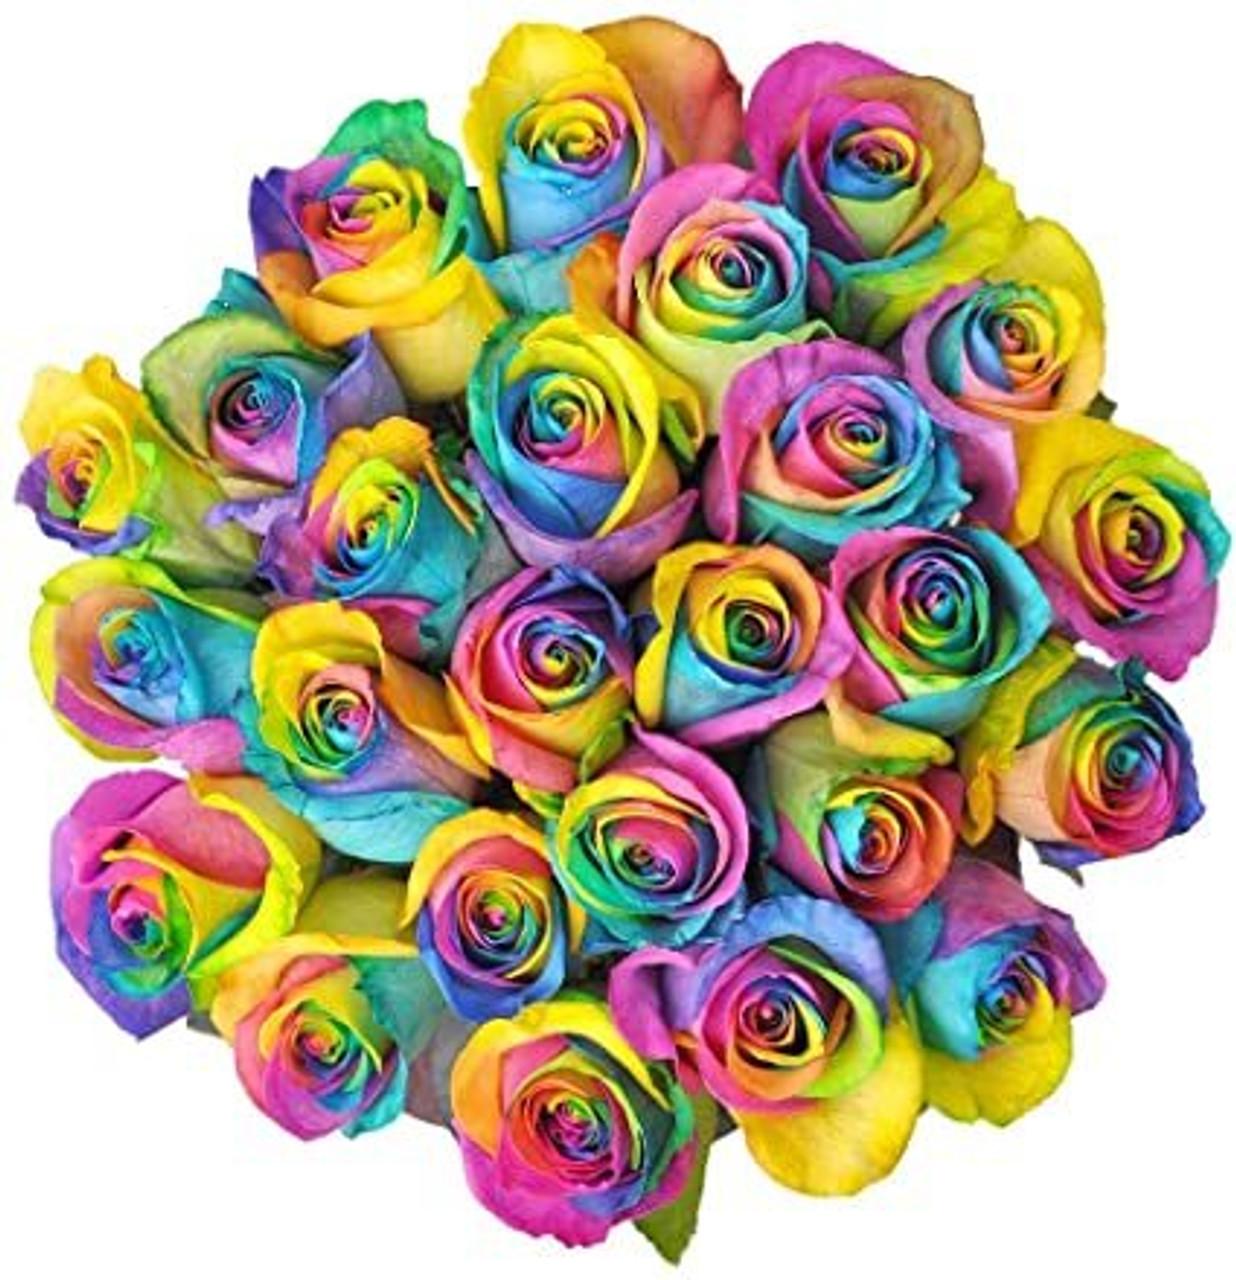 24 Rainbow Ecuadorian Roses